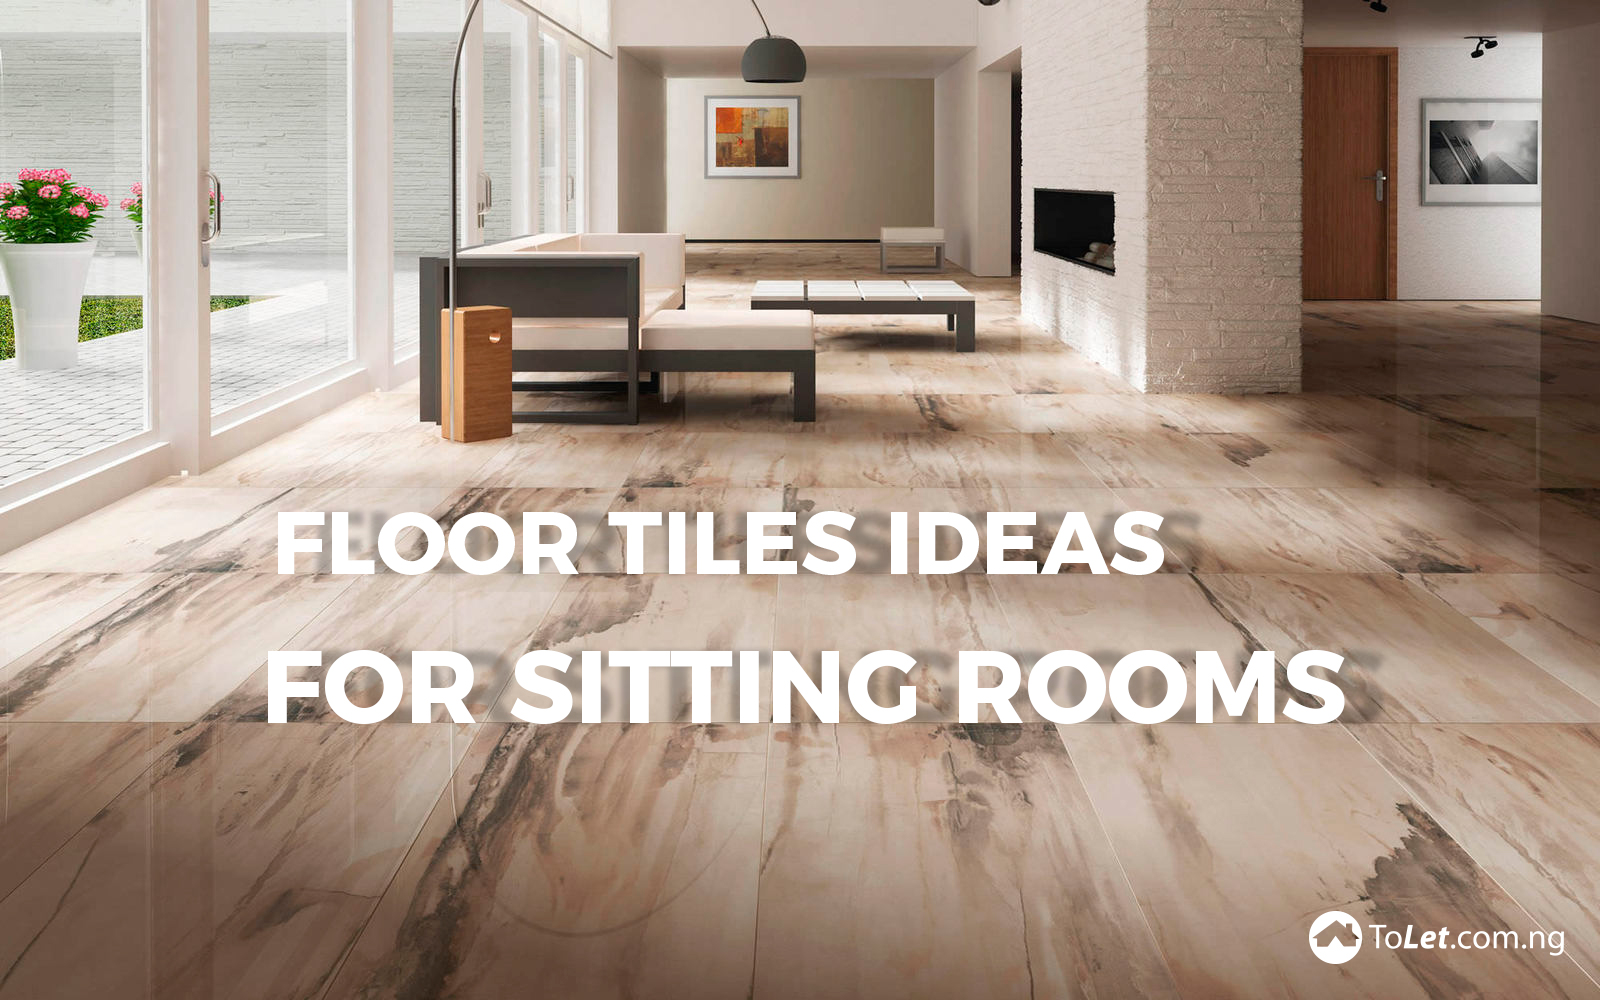 Floor Tiles Ideas for Sitting Rooms  PropertyPro Insider